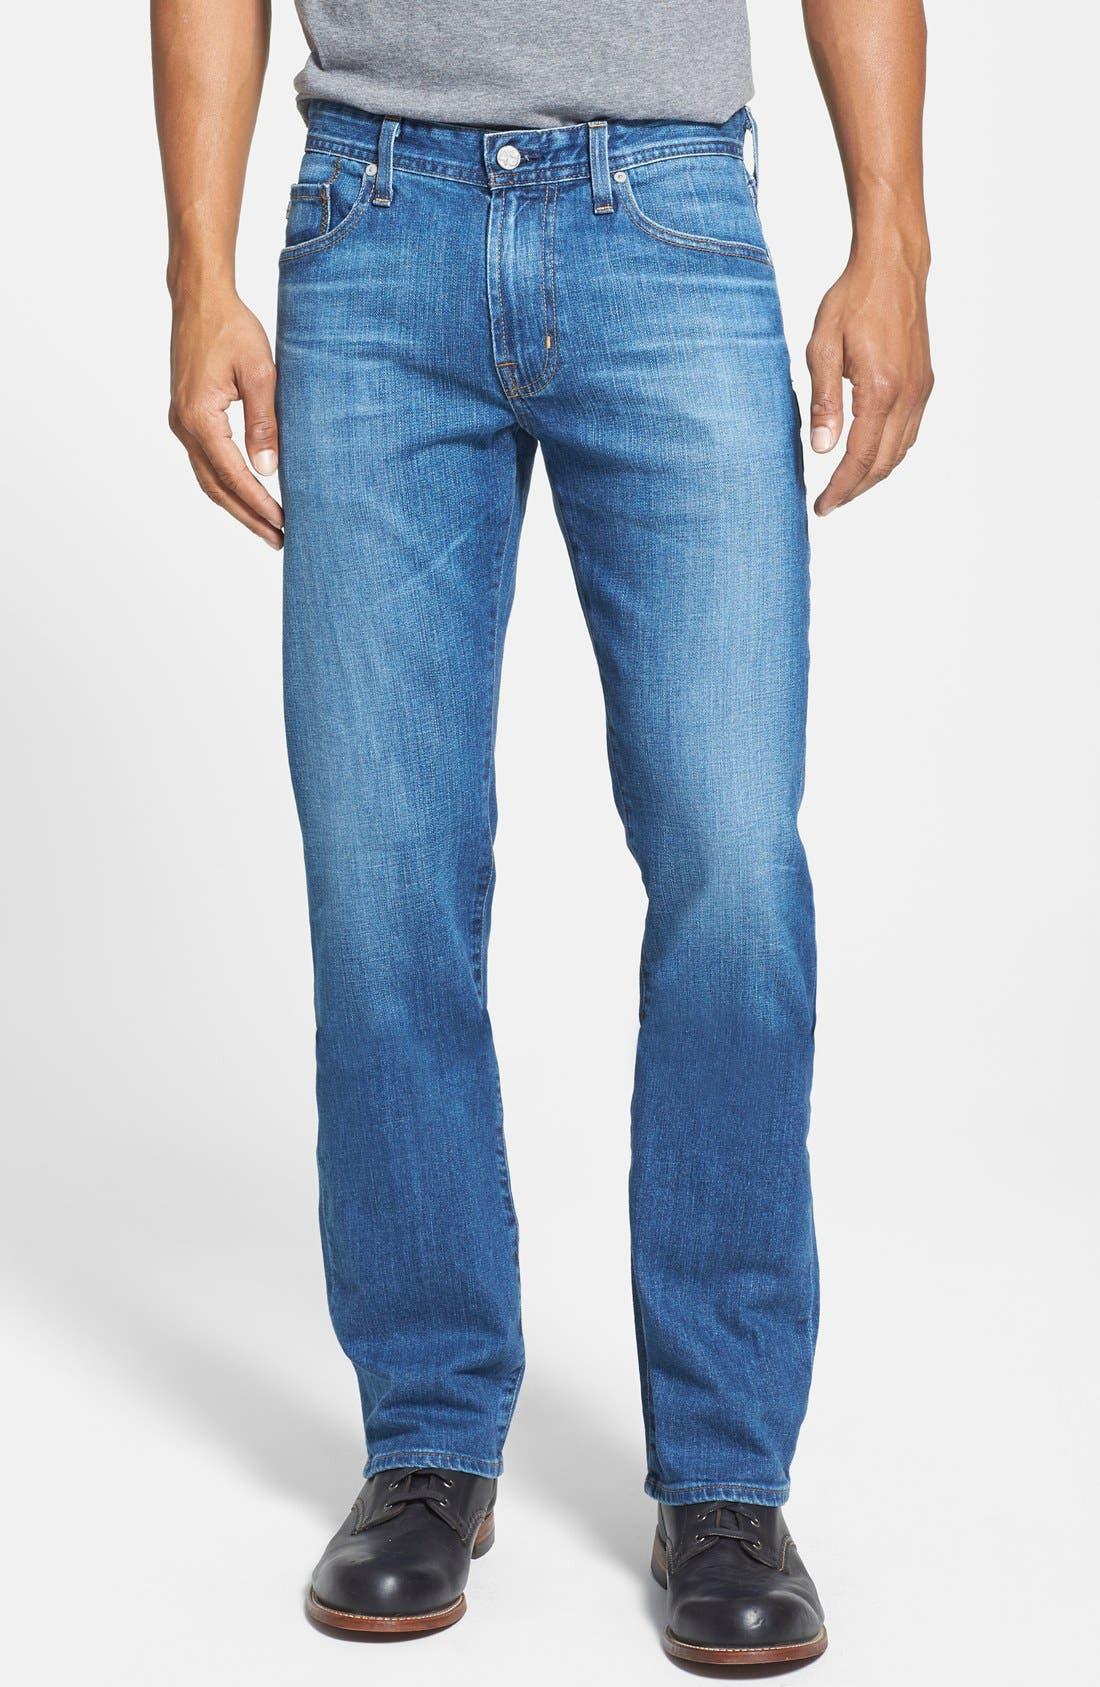 Alternate Image 1 Selected - AG Jeans 'Protégé' Straight Leg Jeans (Eleven Year Wildcraft)